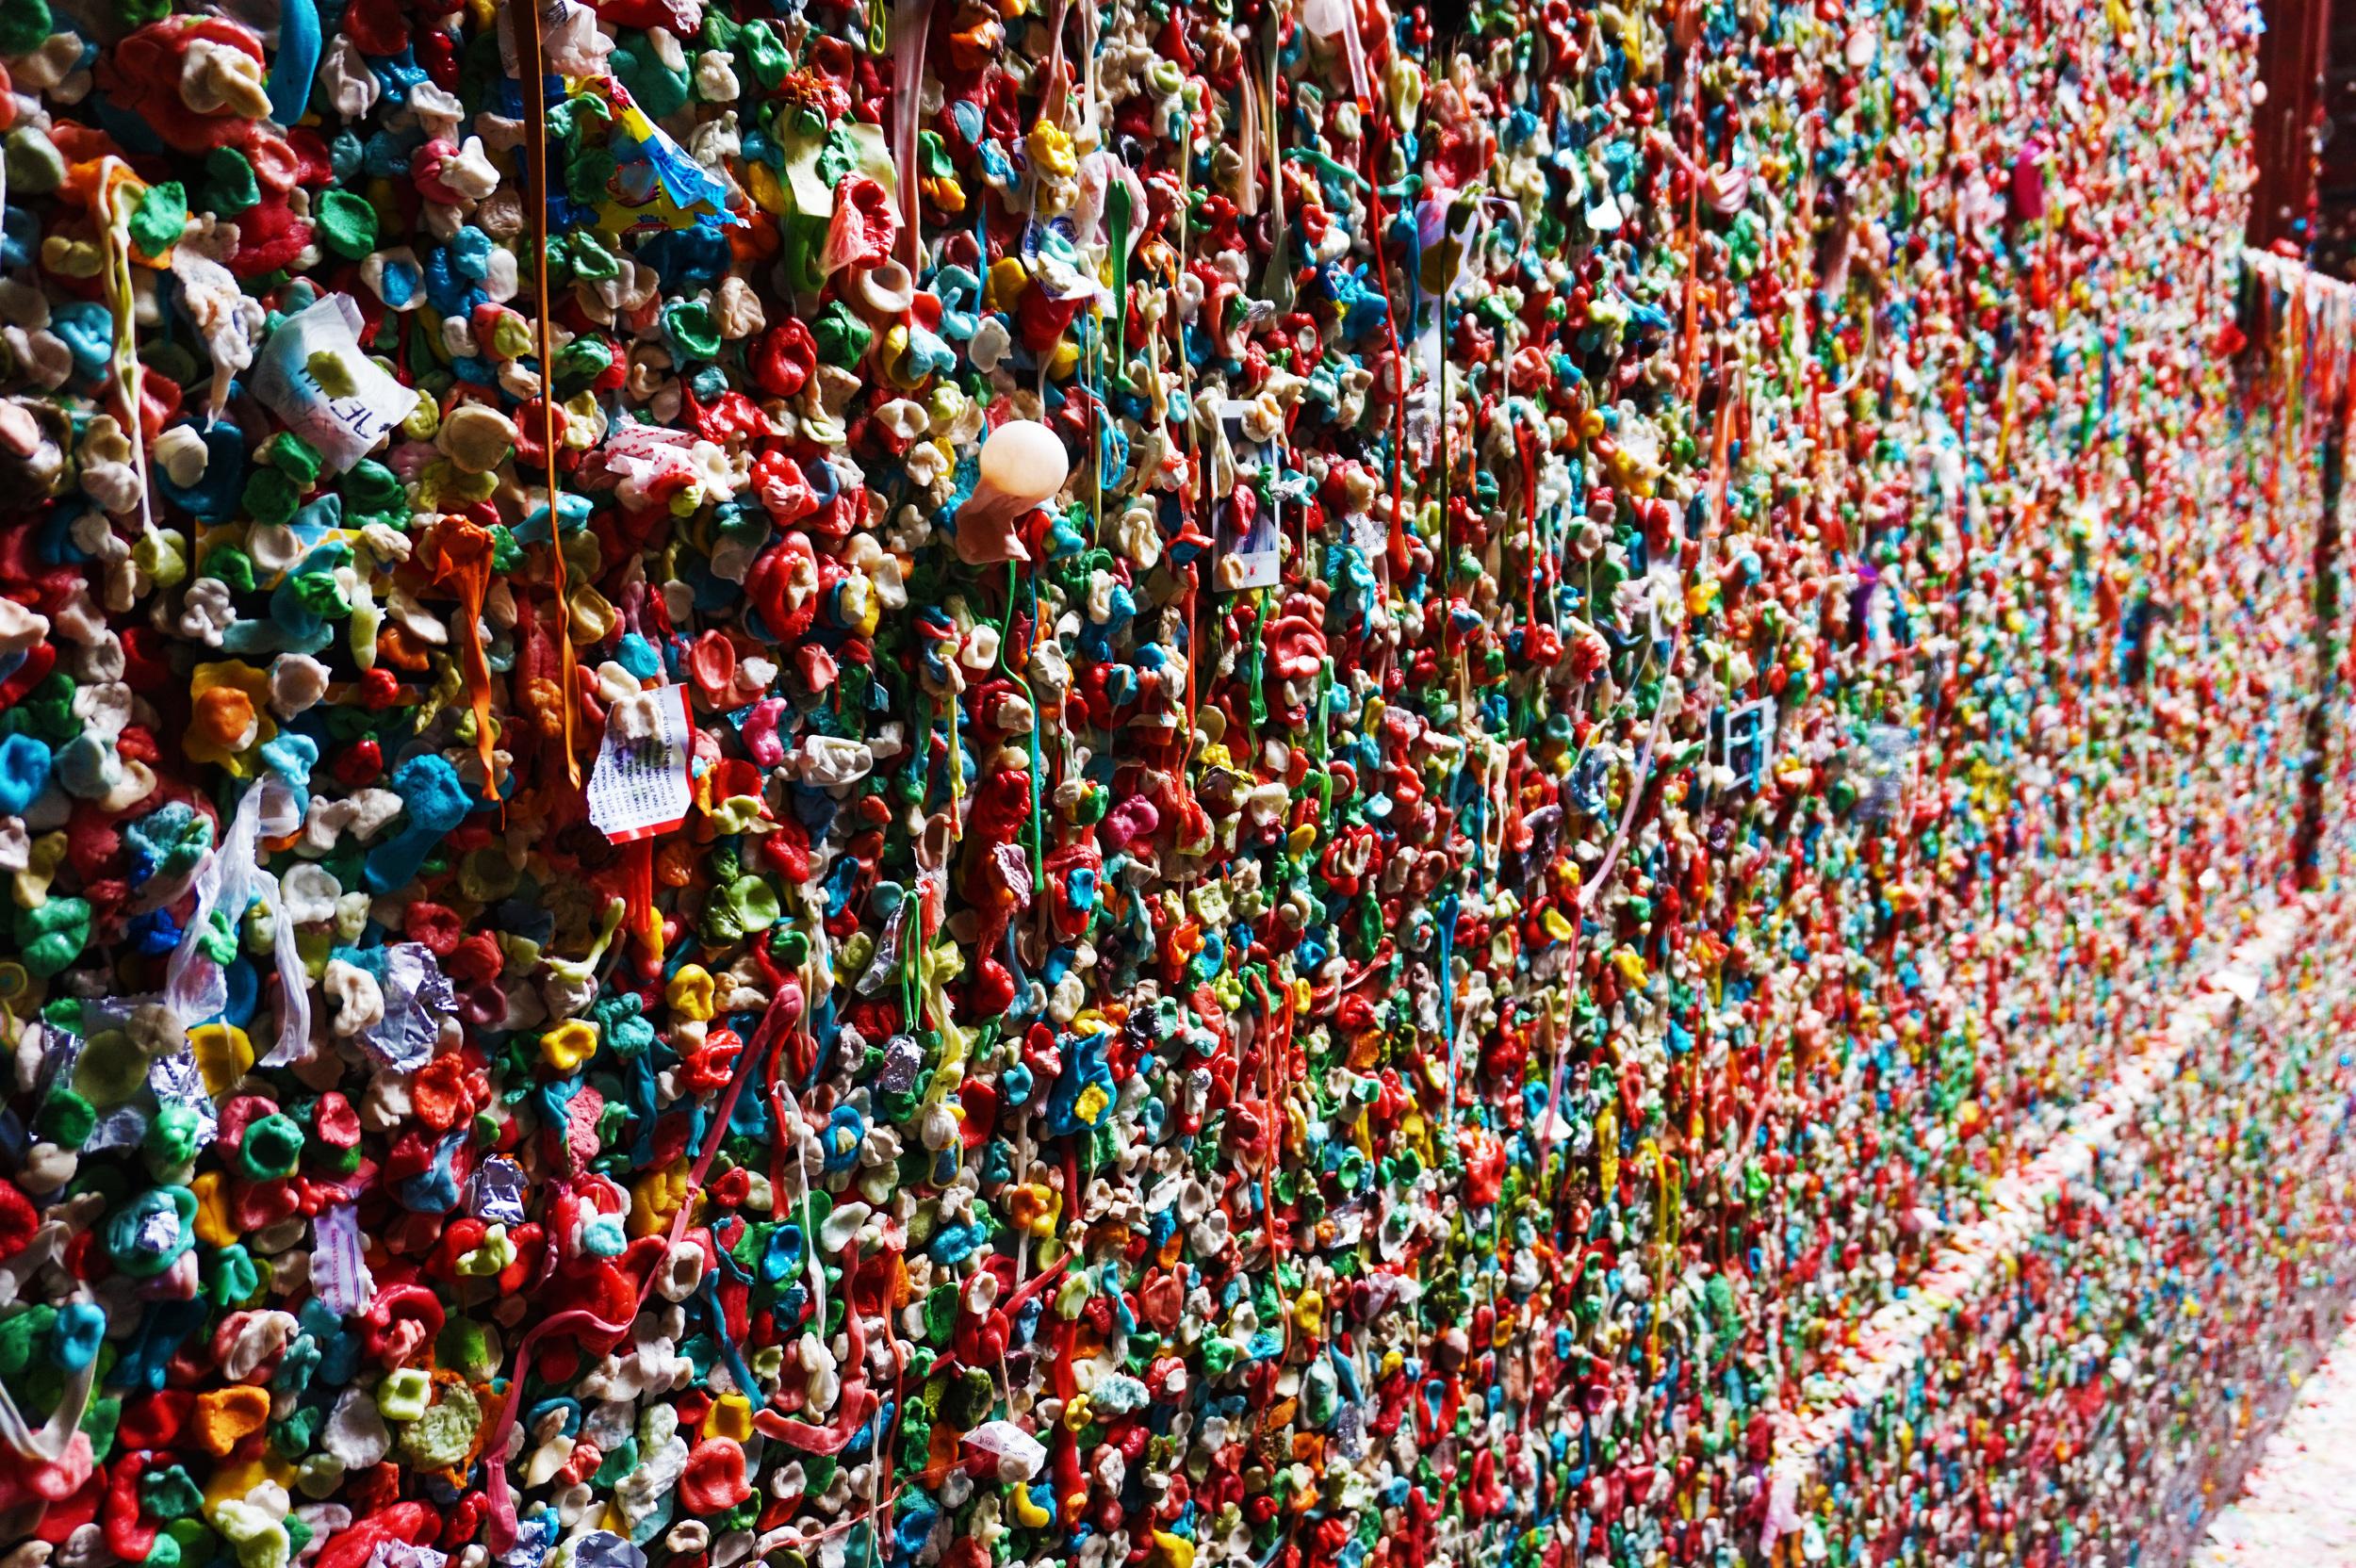 The Gum Wall AKA a germaphobe's worst nightmare